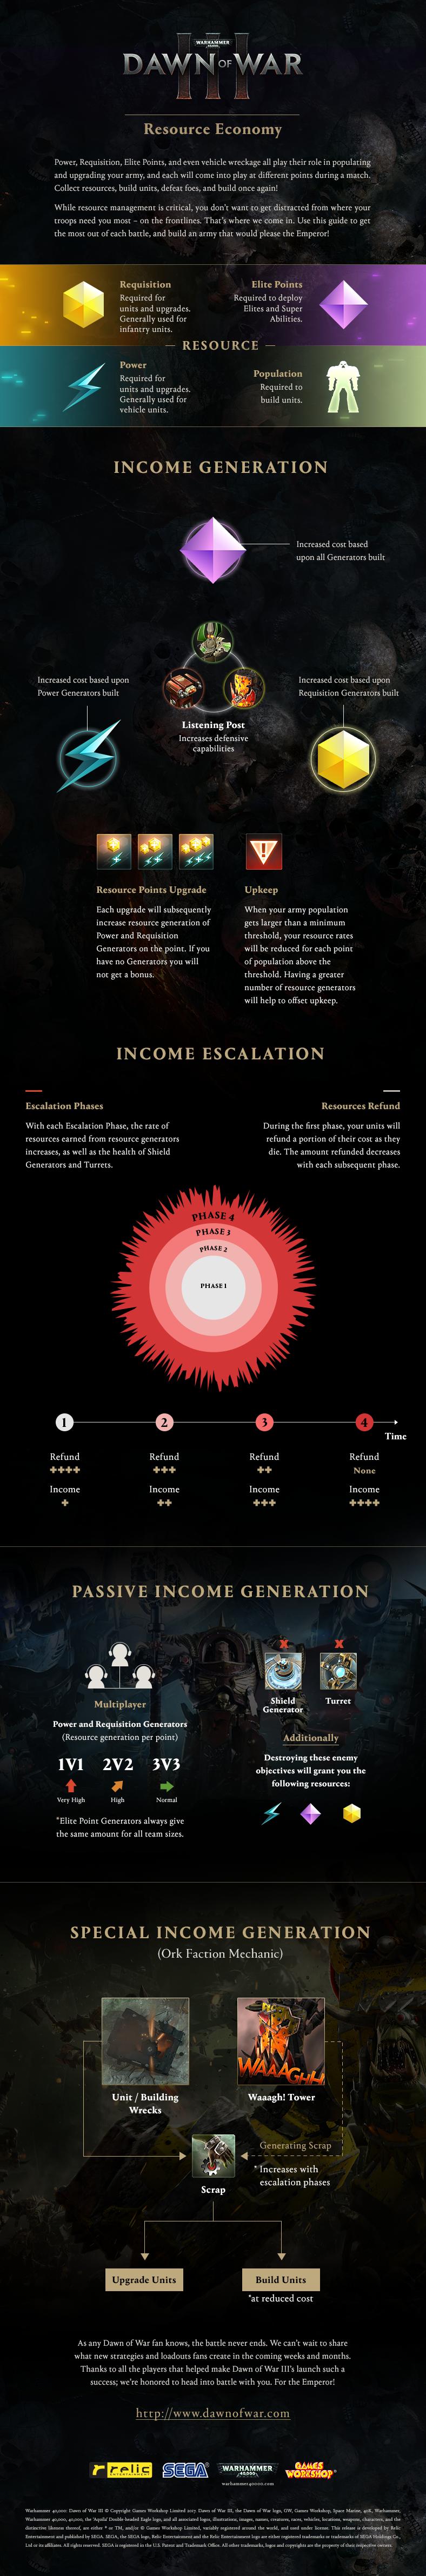 Dow3_Infographic_Economy_v3